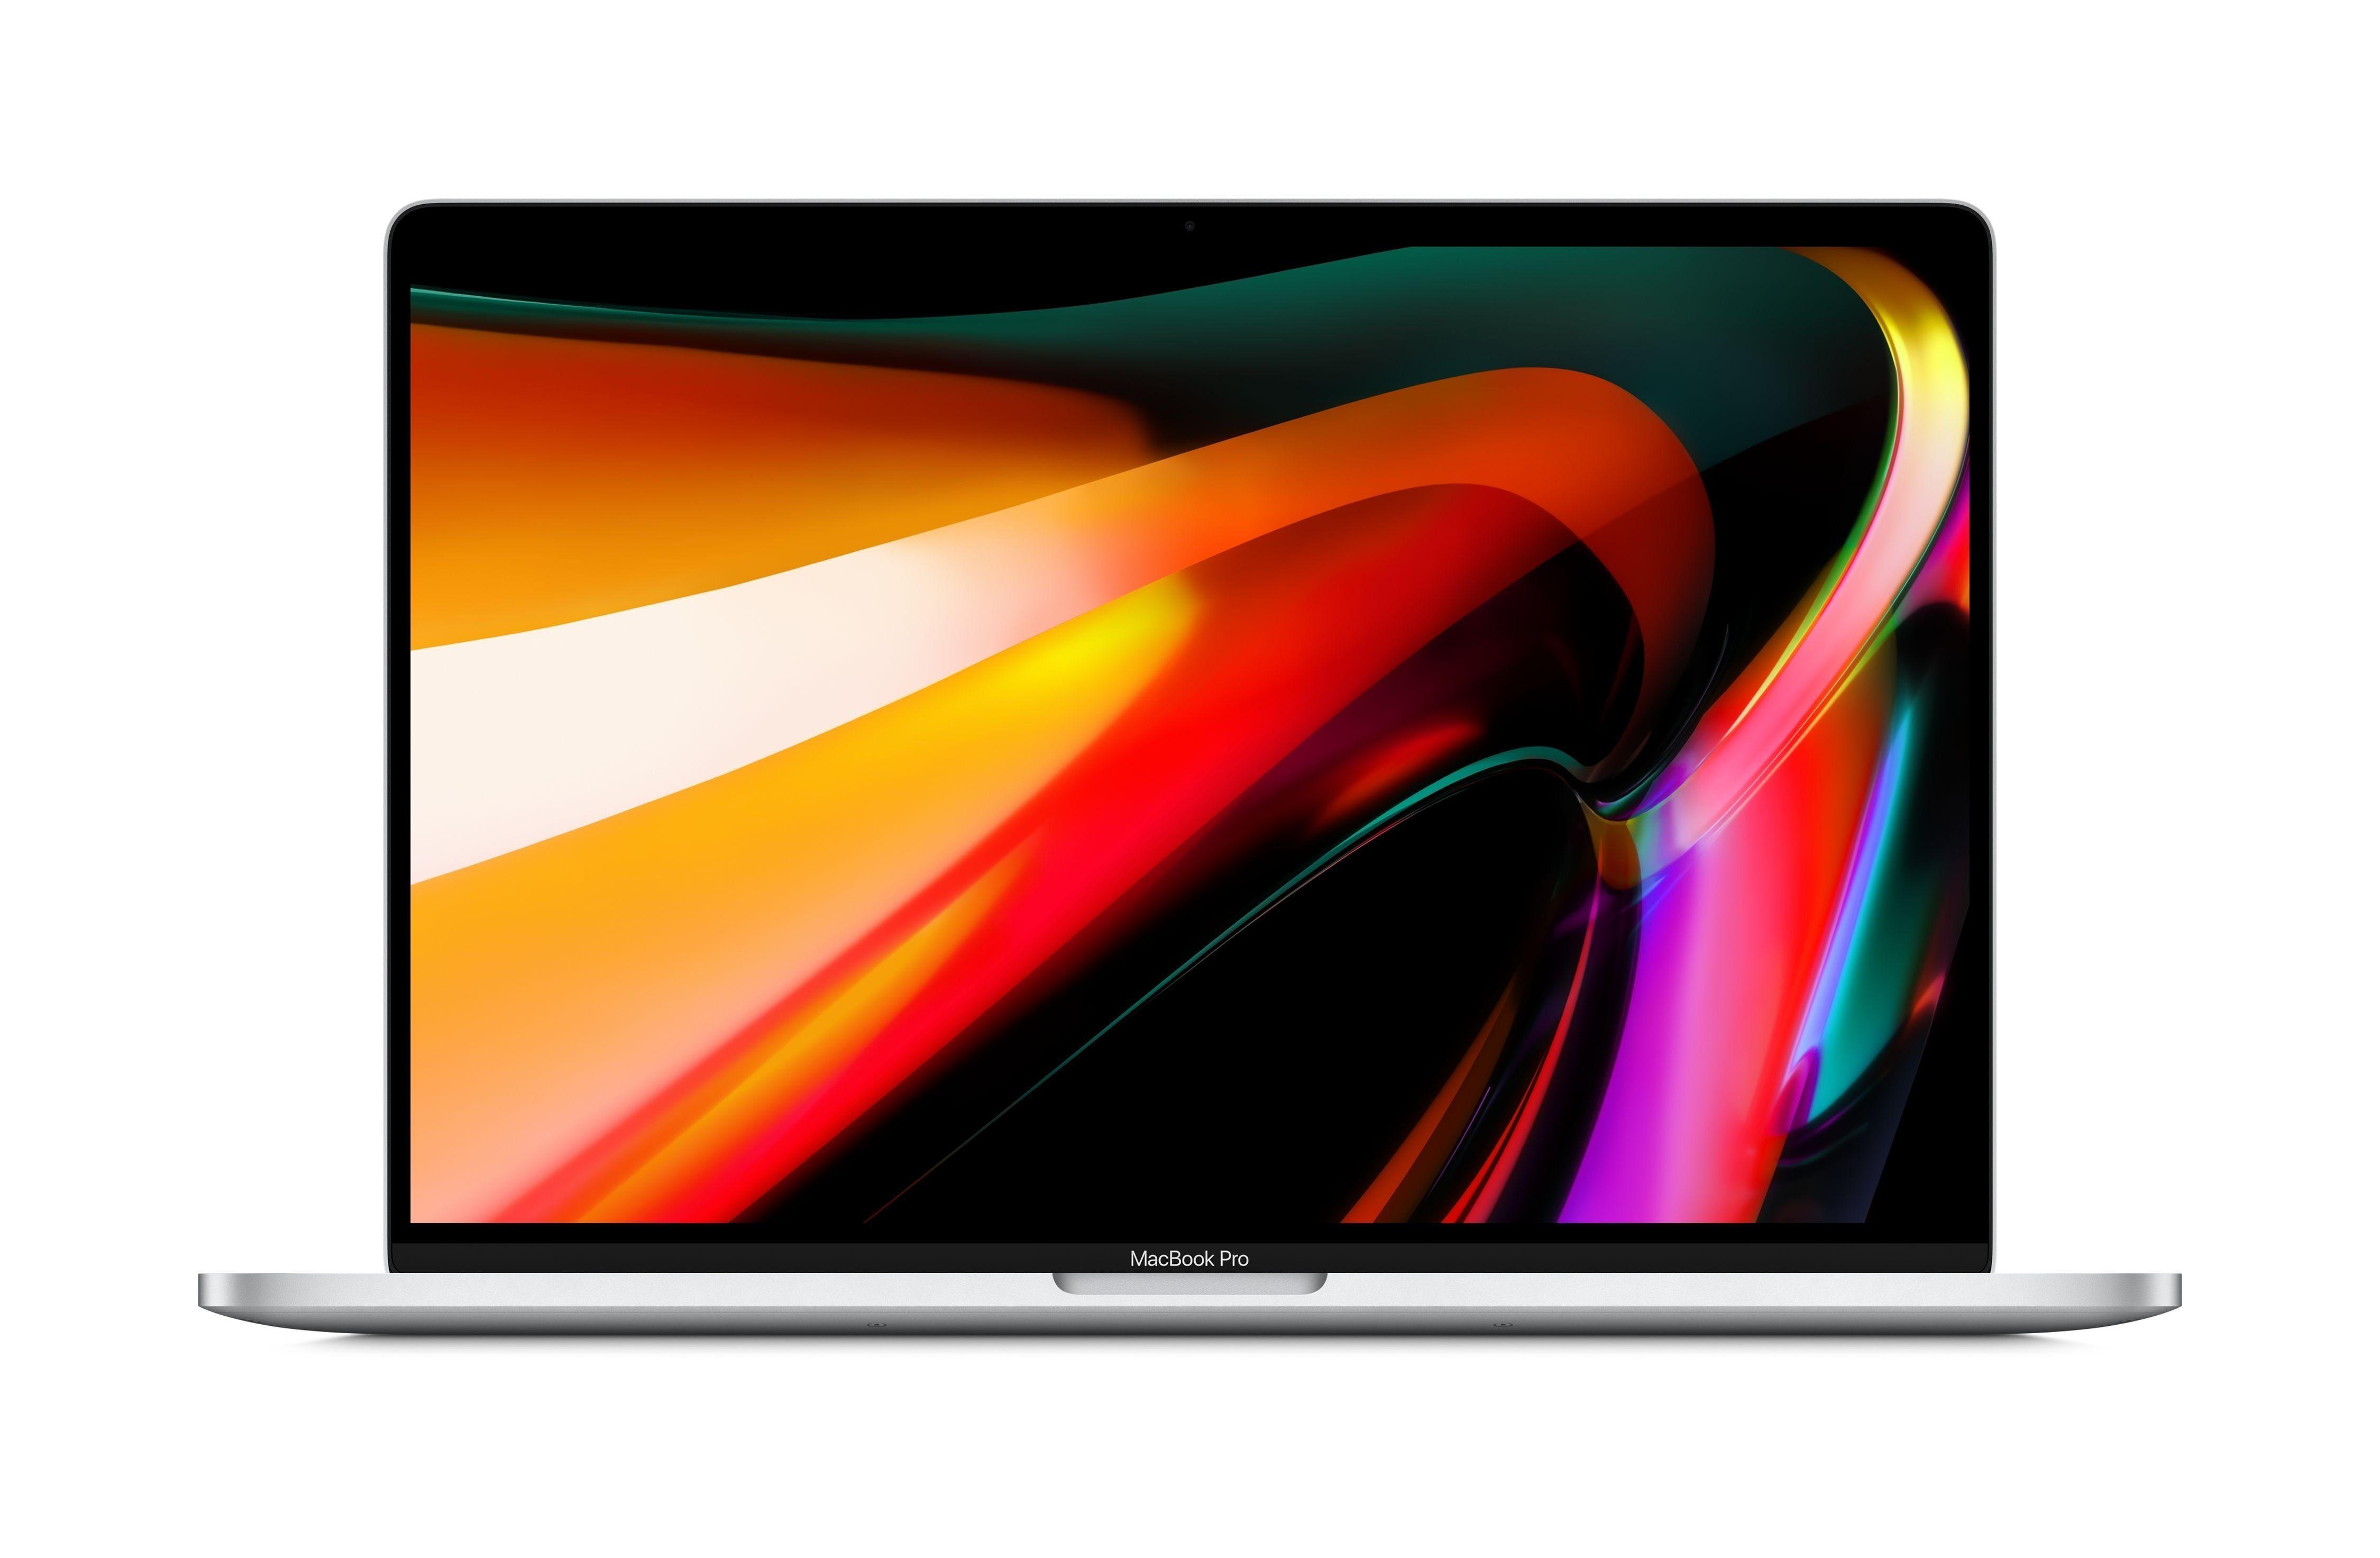 "Apple MacBook Pro 16"" Retina »40,6 cm (16) Intel Core i7, SSD, DDR4 SDRAM«, silber"